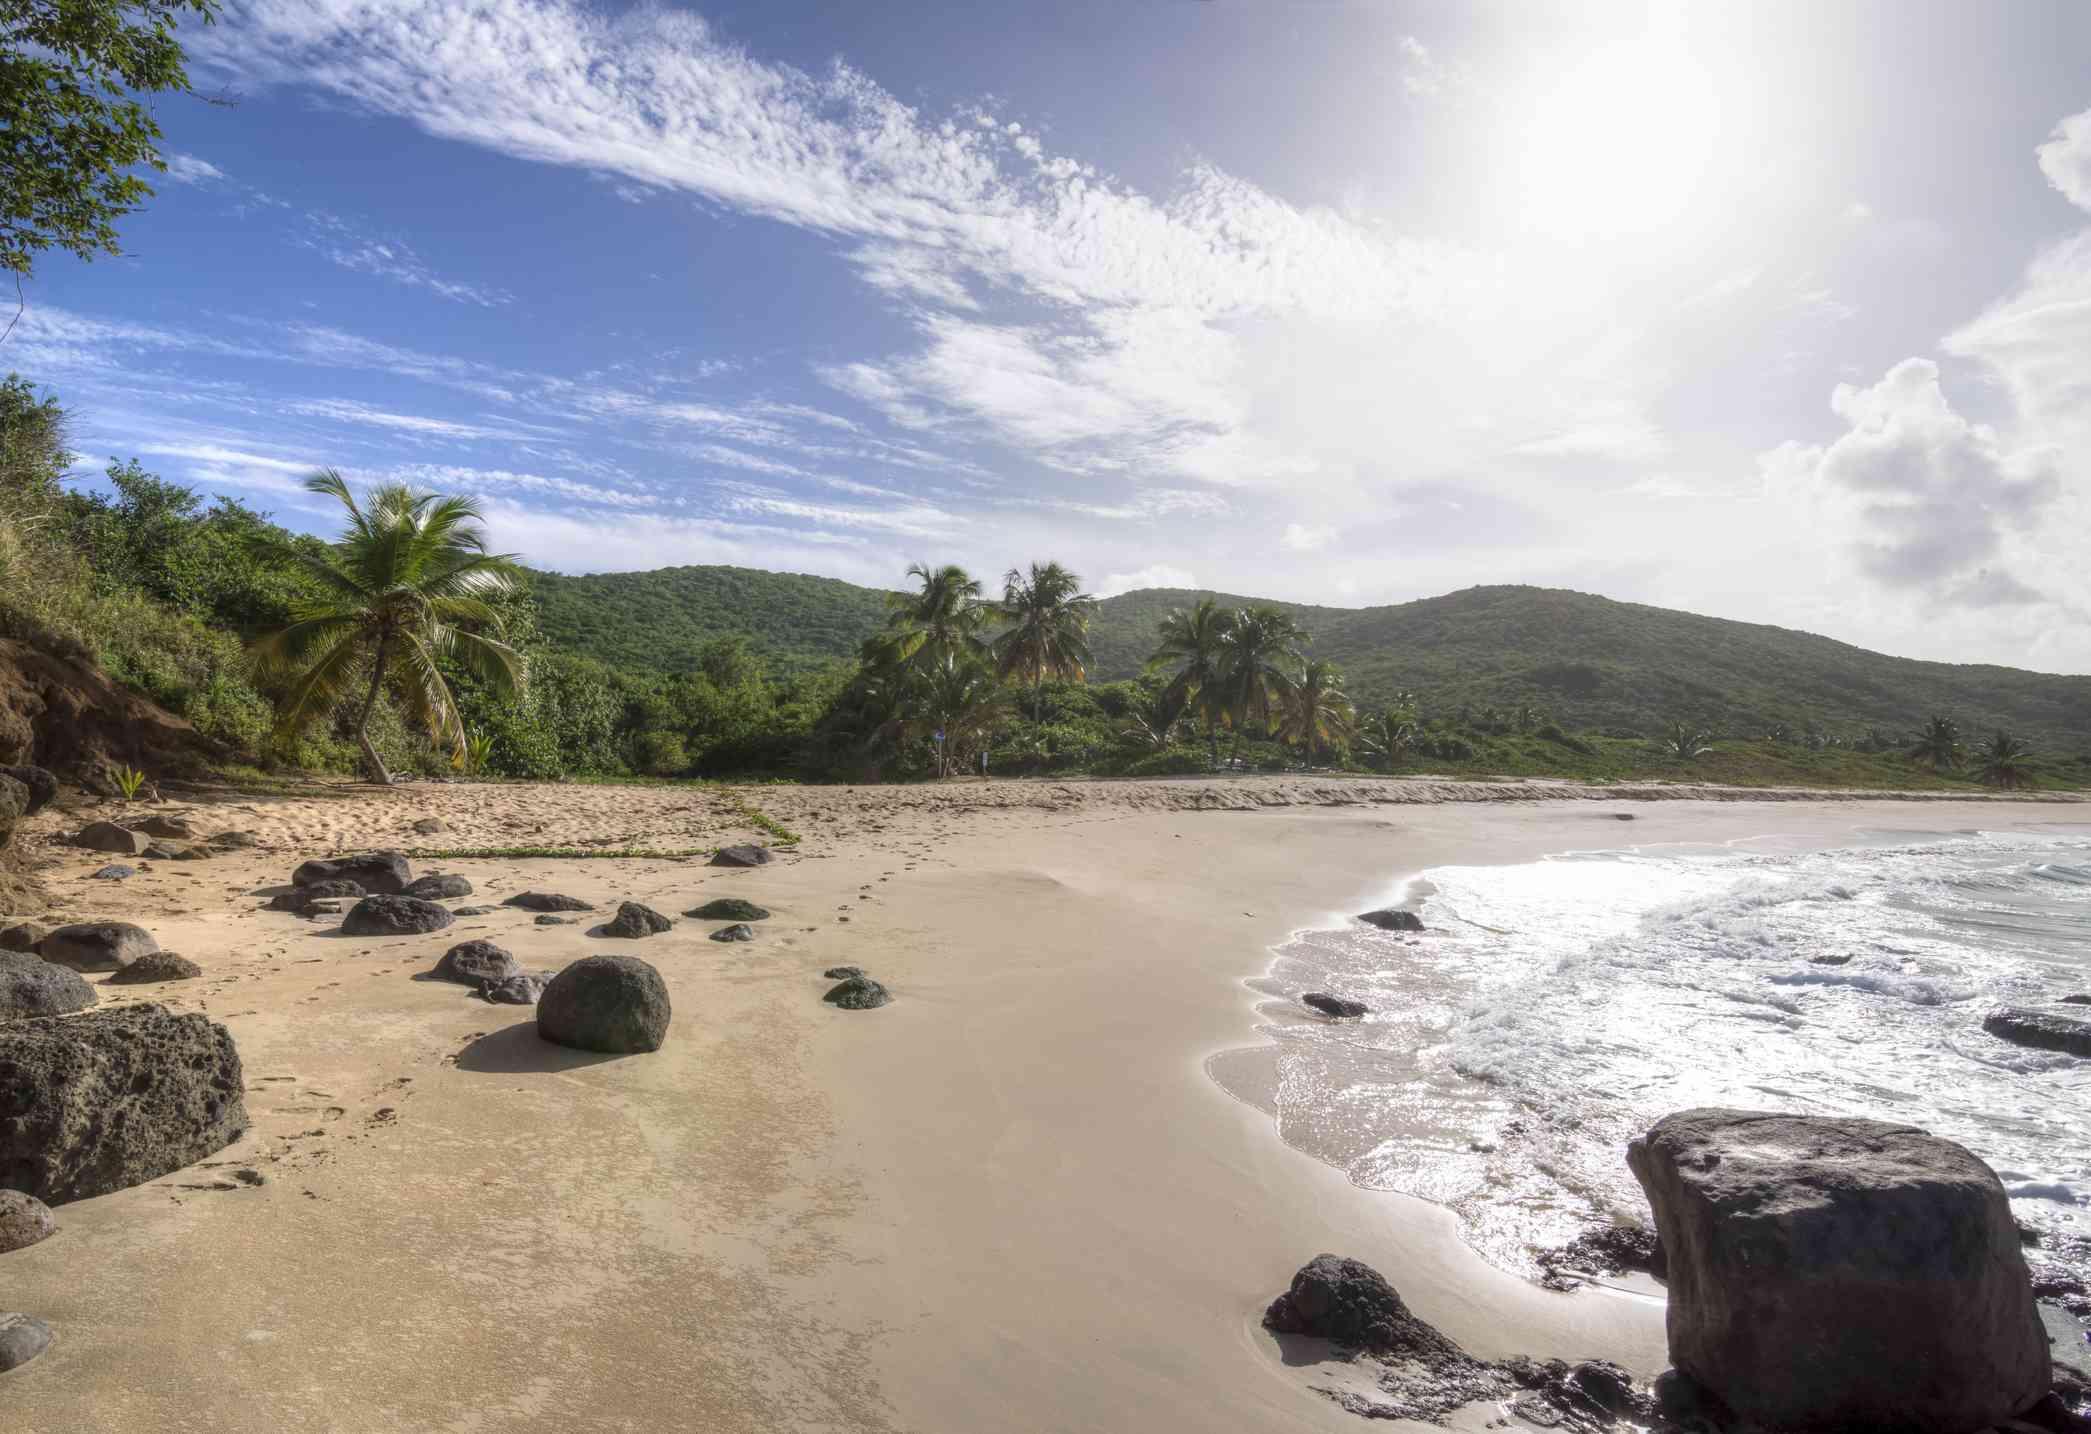 Playa Brava beach on Isla Culebra